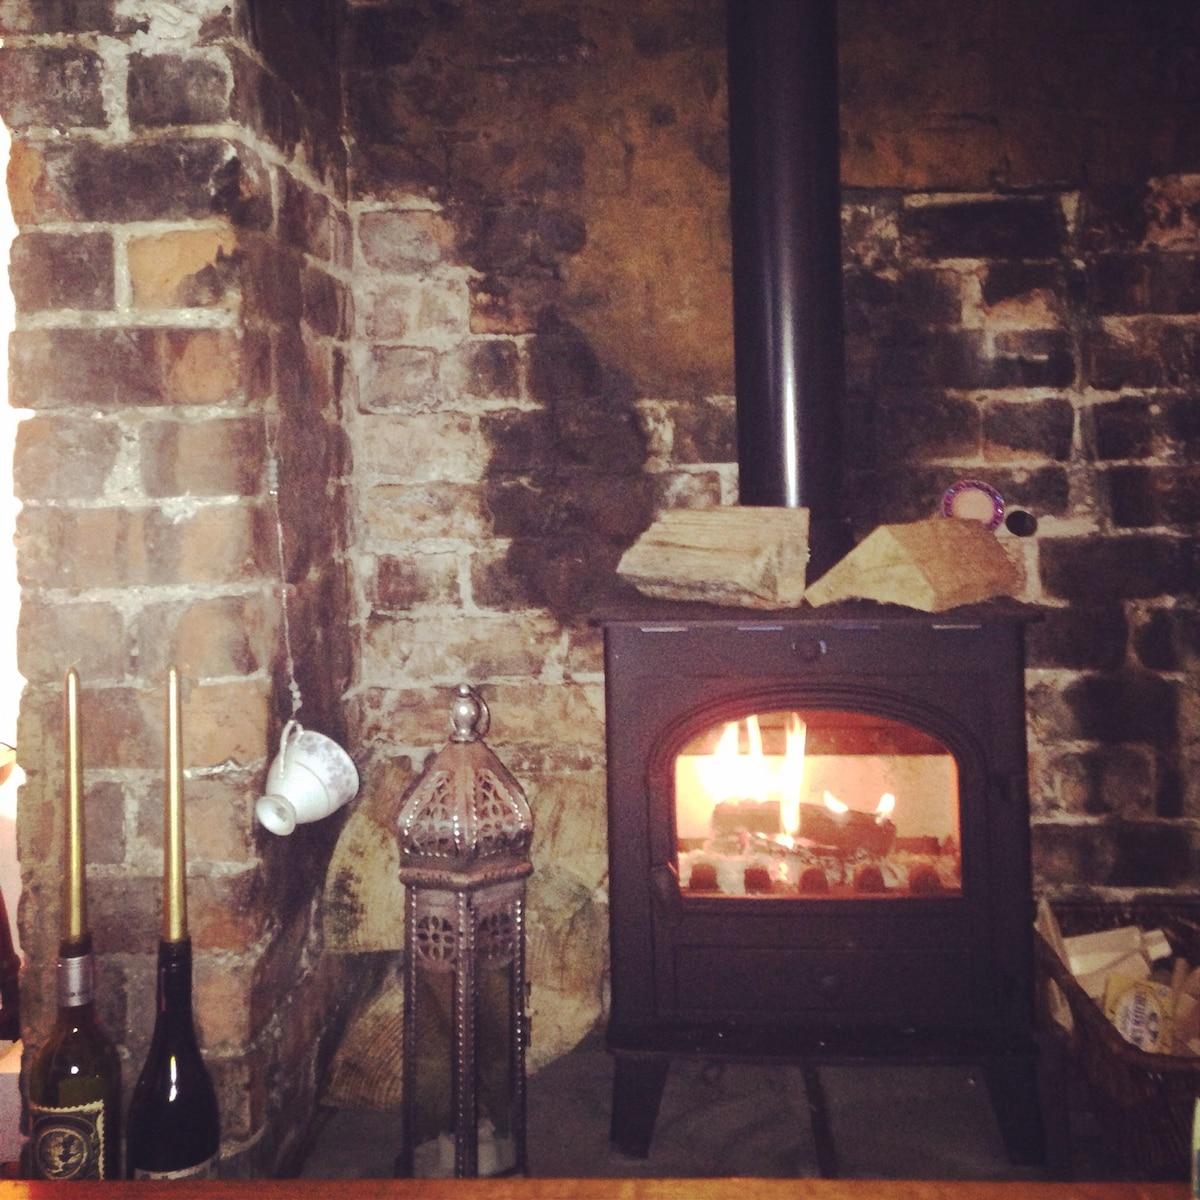 The new wood-burning stove... Toastie warm!